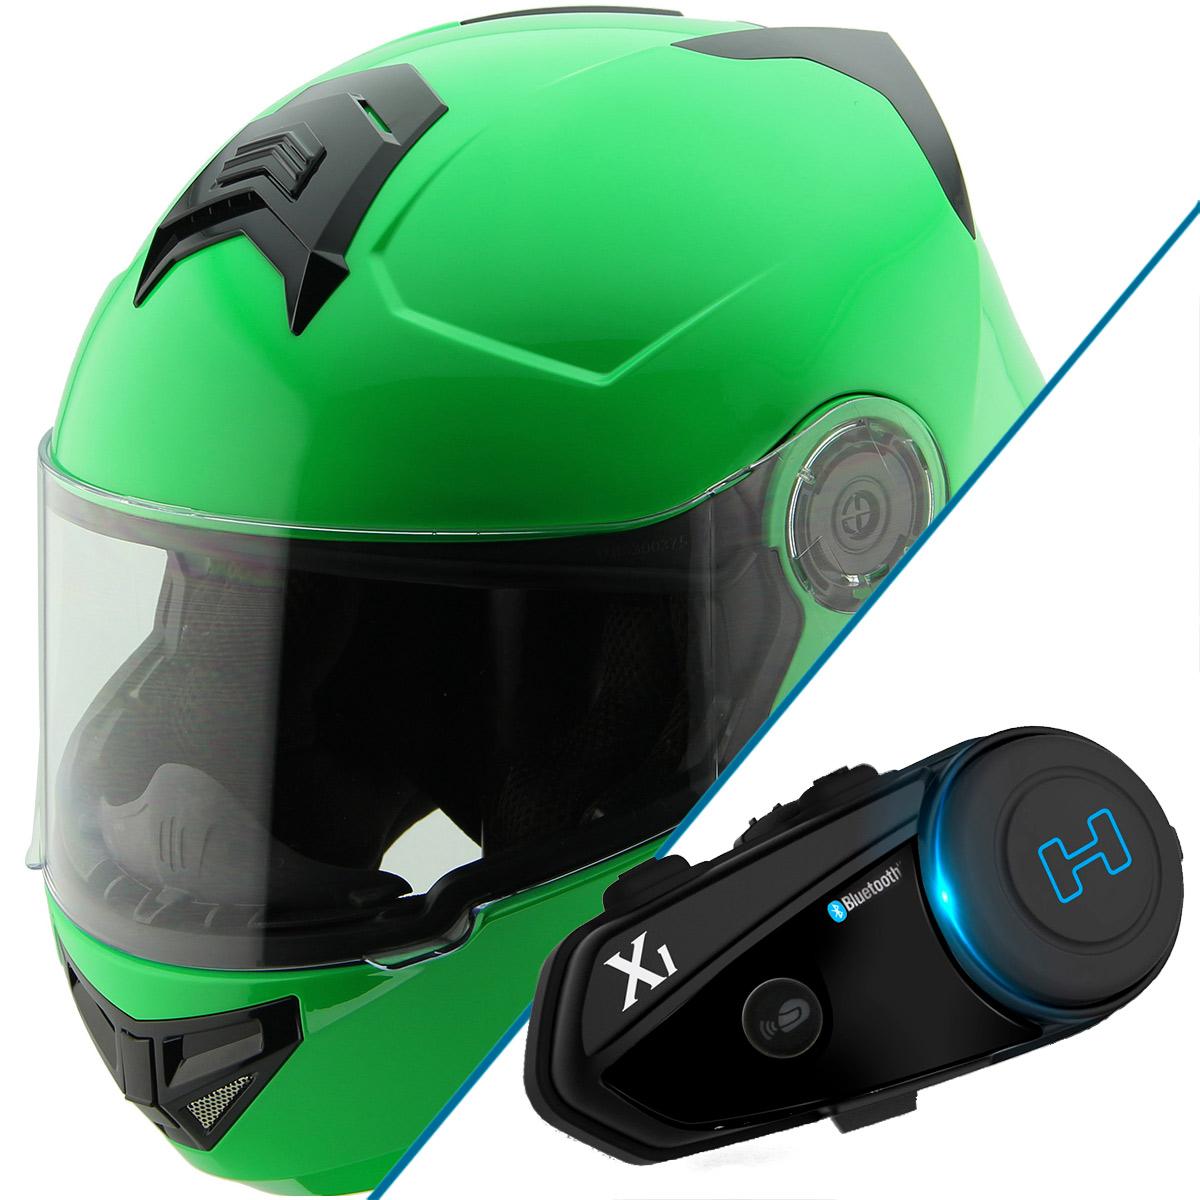 Hawk H-70 Solid Neon Green Modular Motorcycle Helmet with Black X1 Bluetooth He